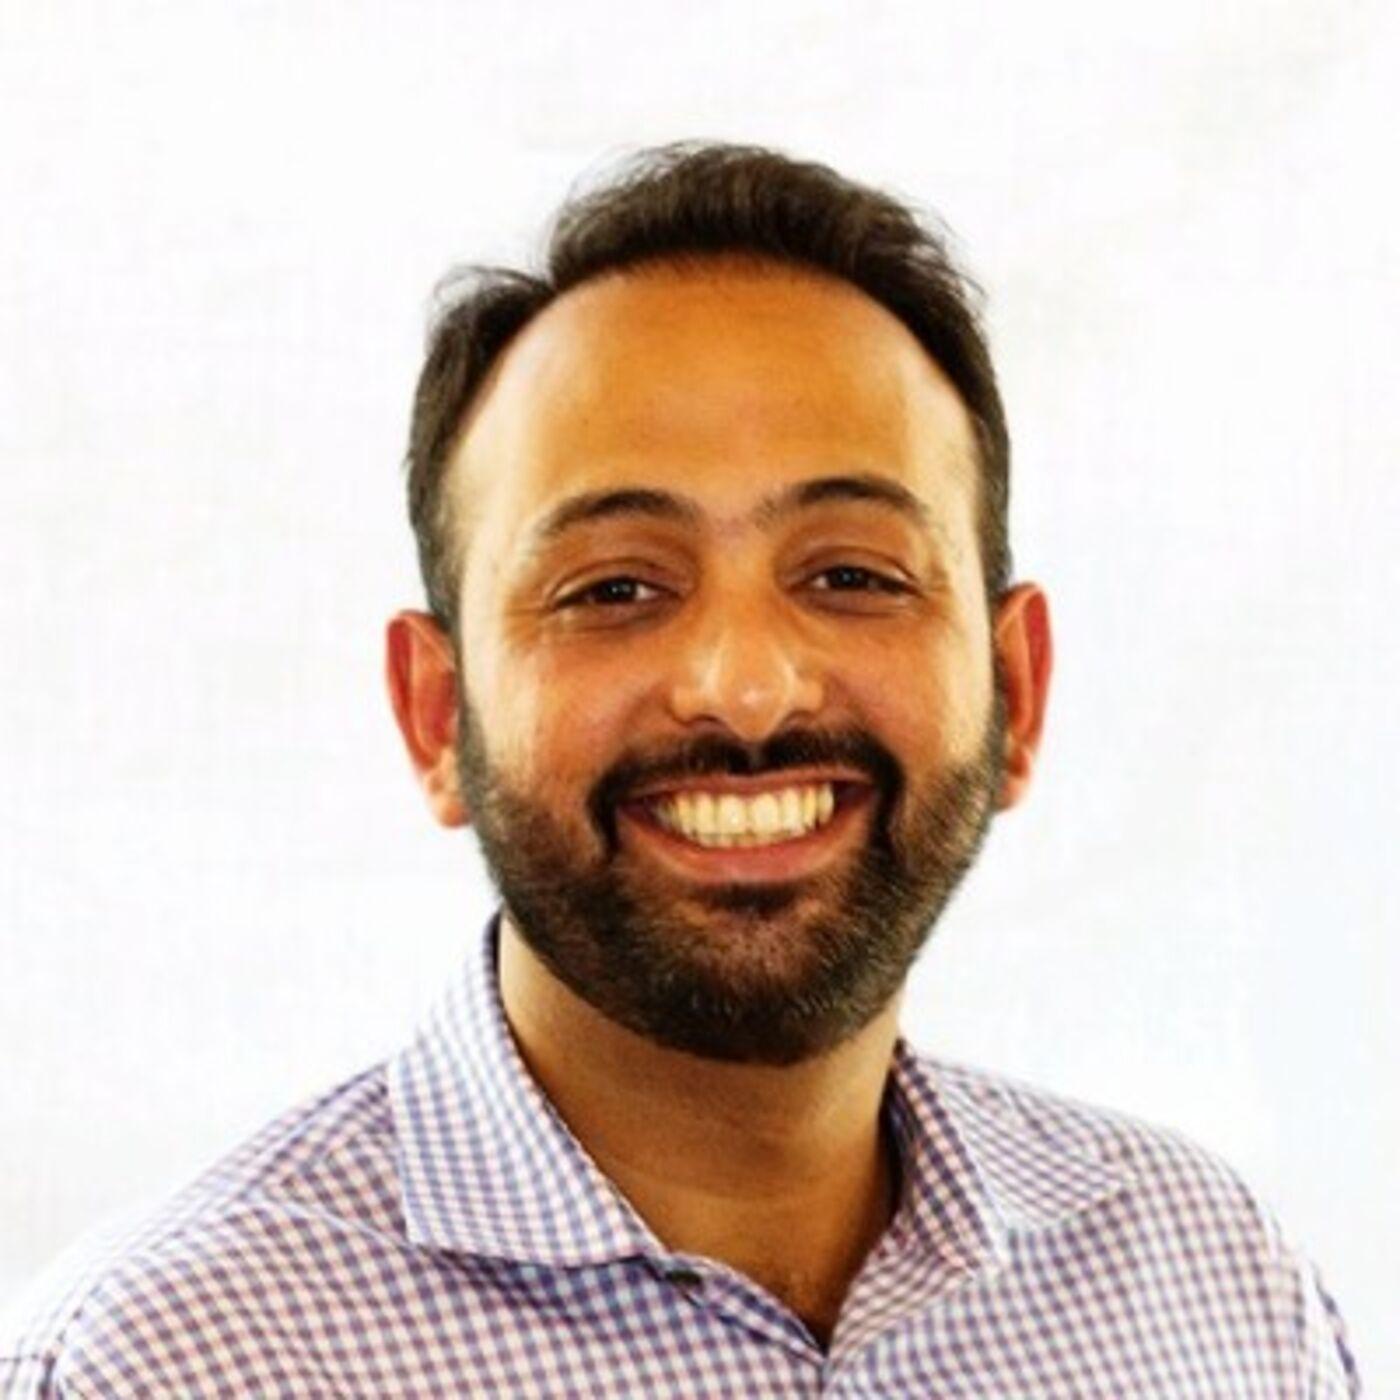 Episode 54: Prateek Mathur - Sales Manager Enablement